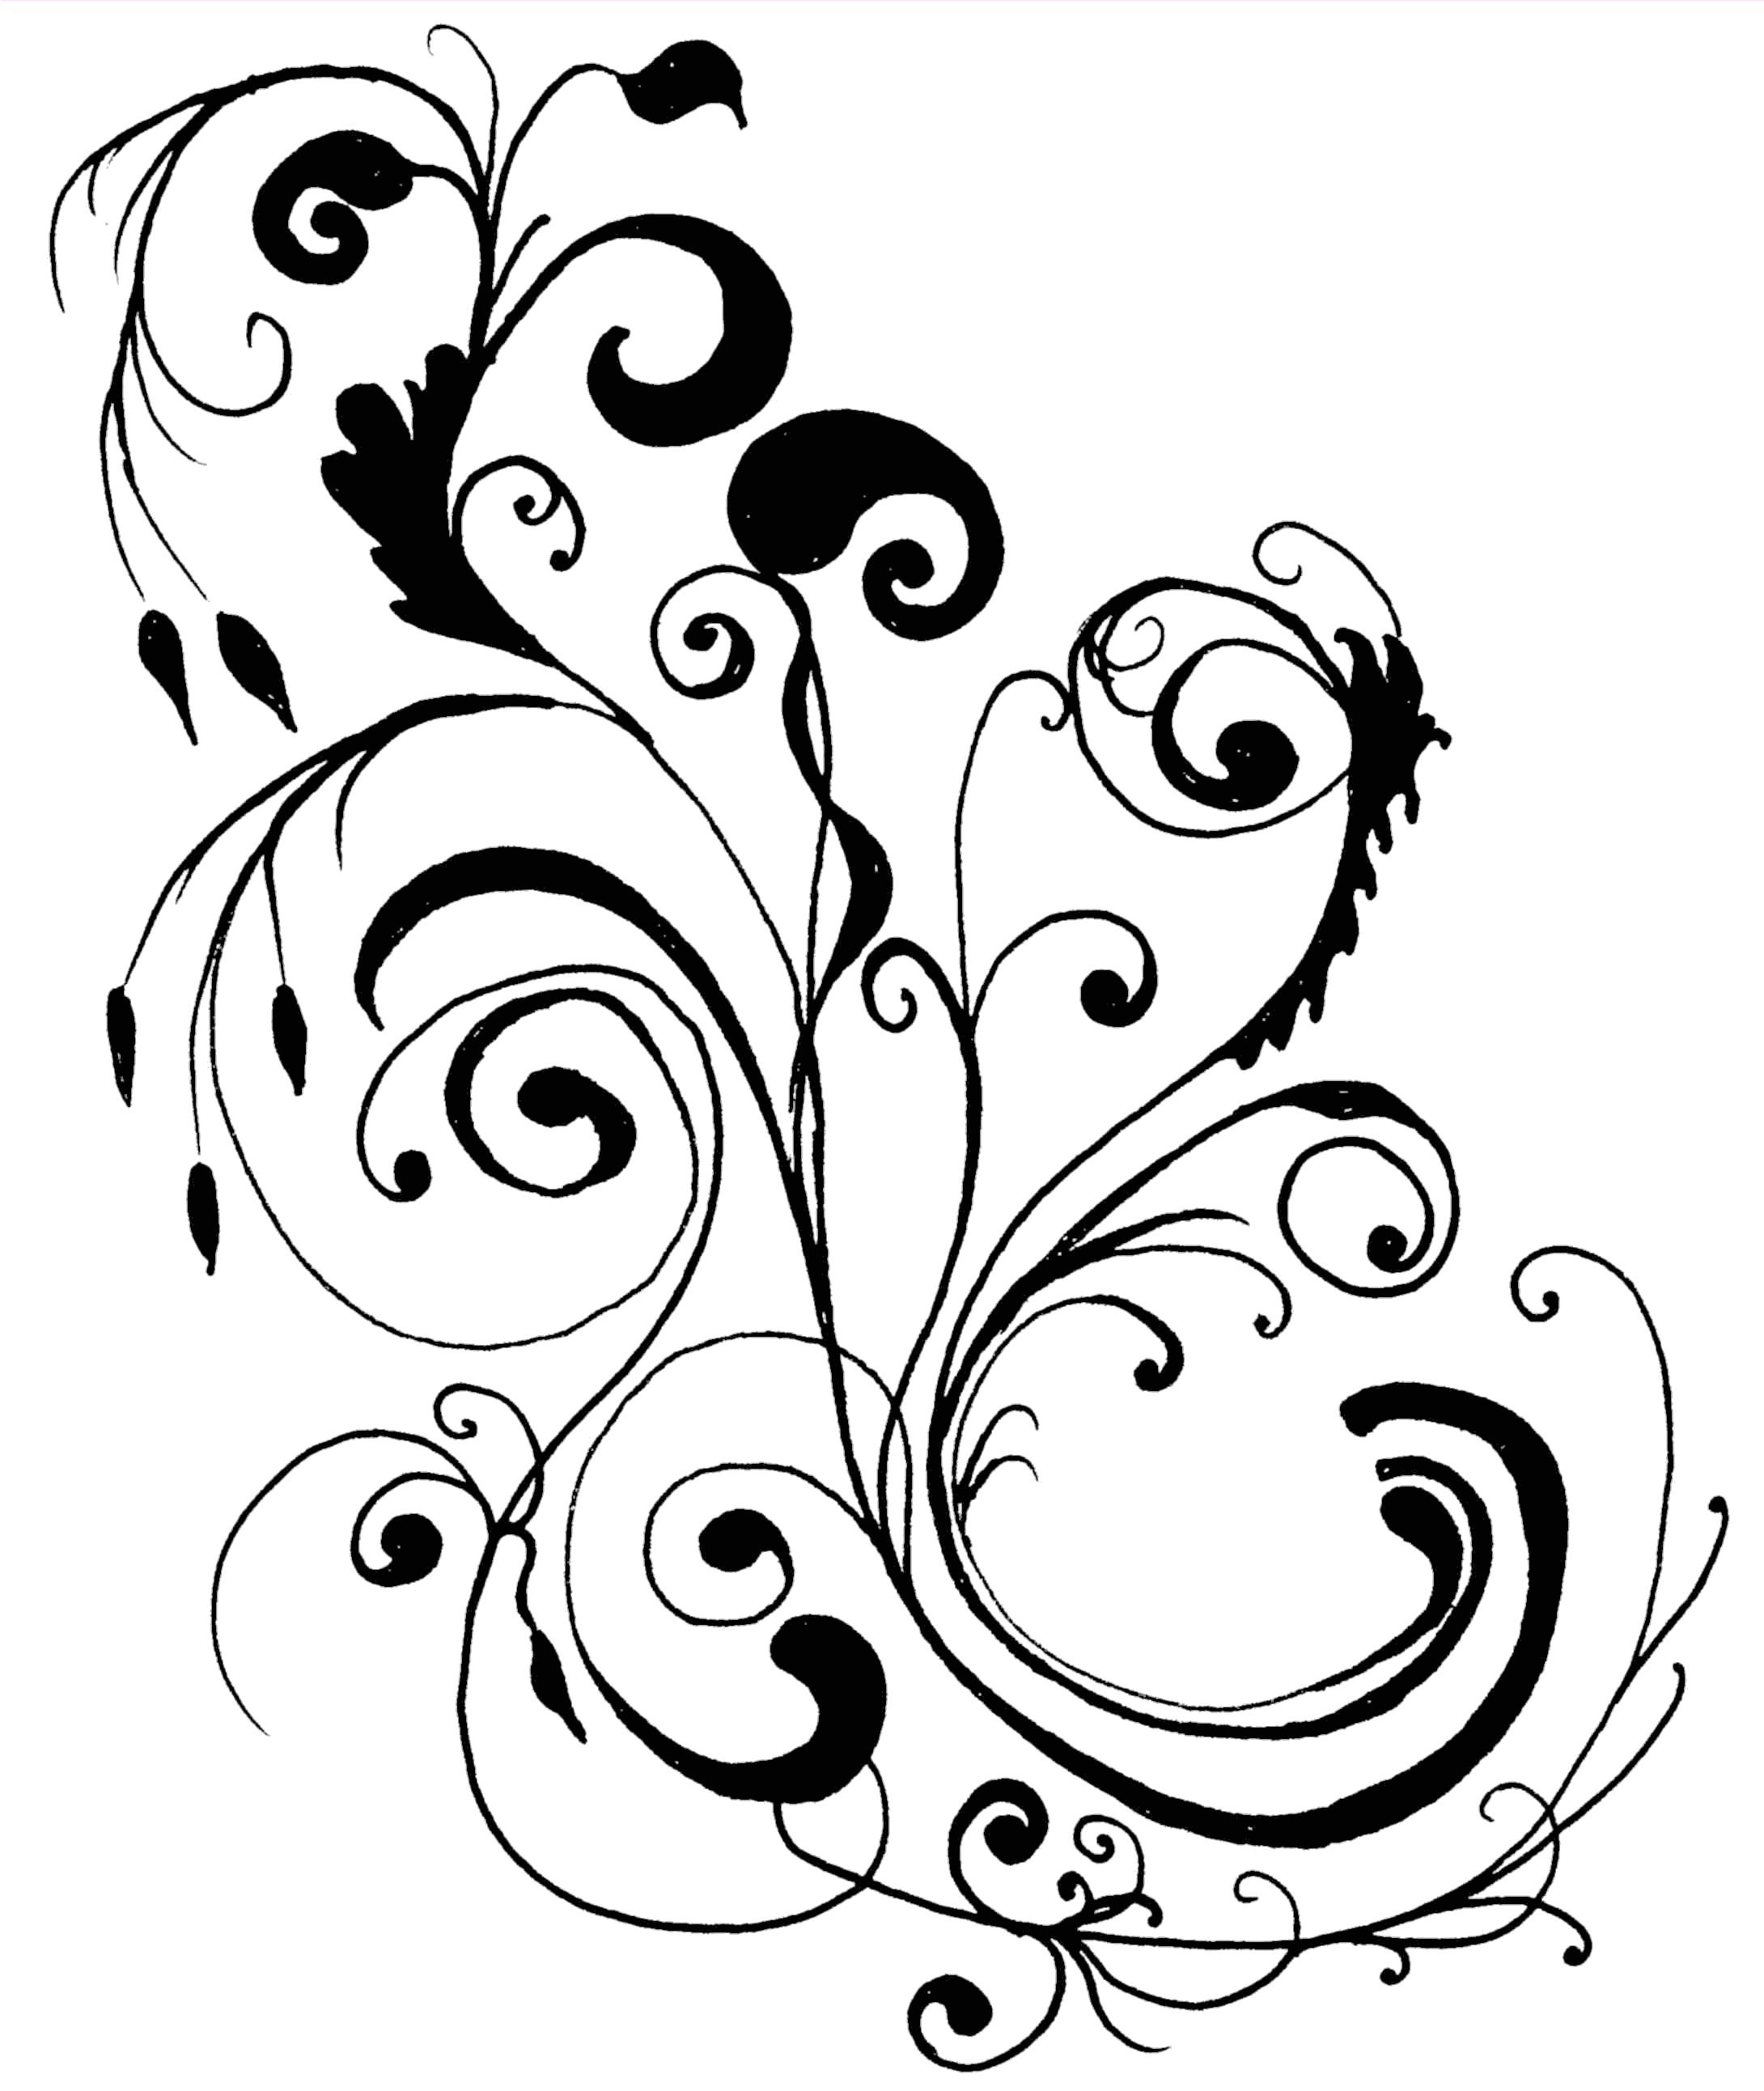 Flower library clip art. Boarder clipart border design